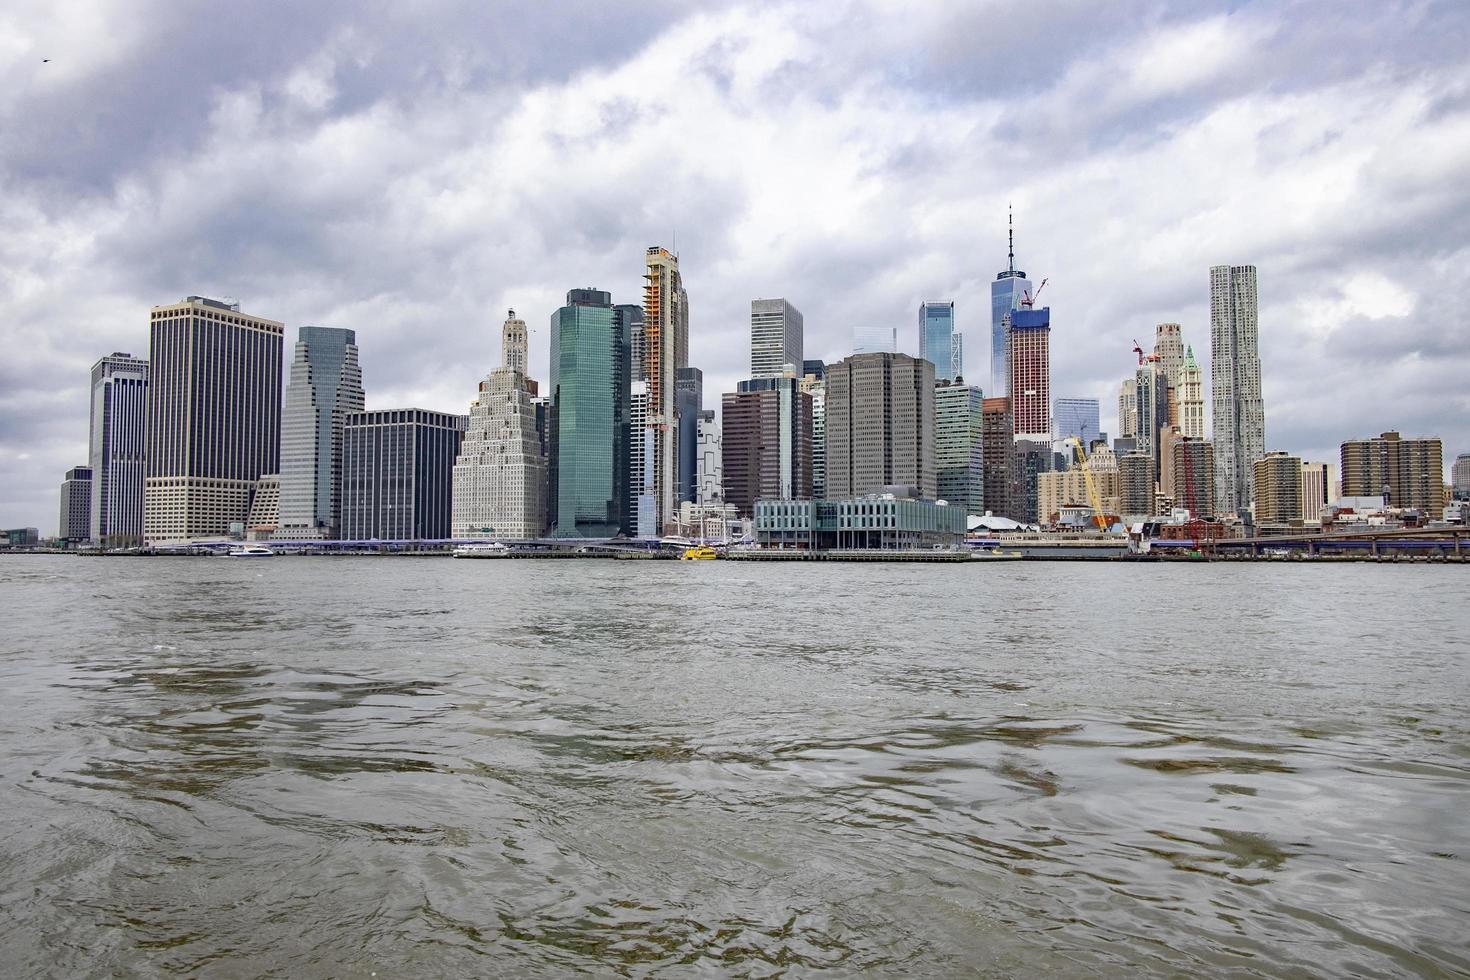 New York City skyline under cloudy sky photo